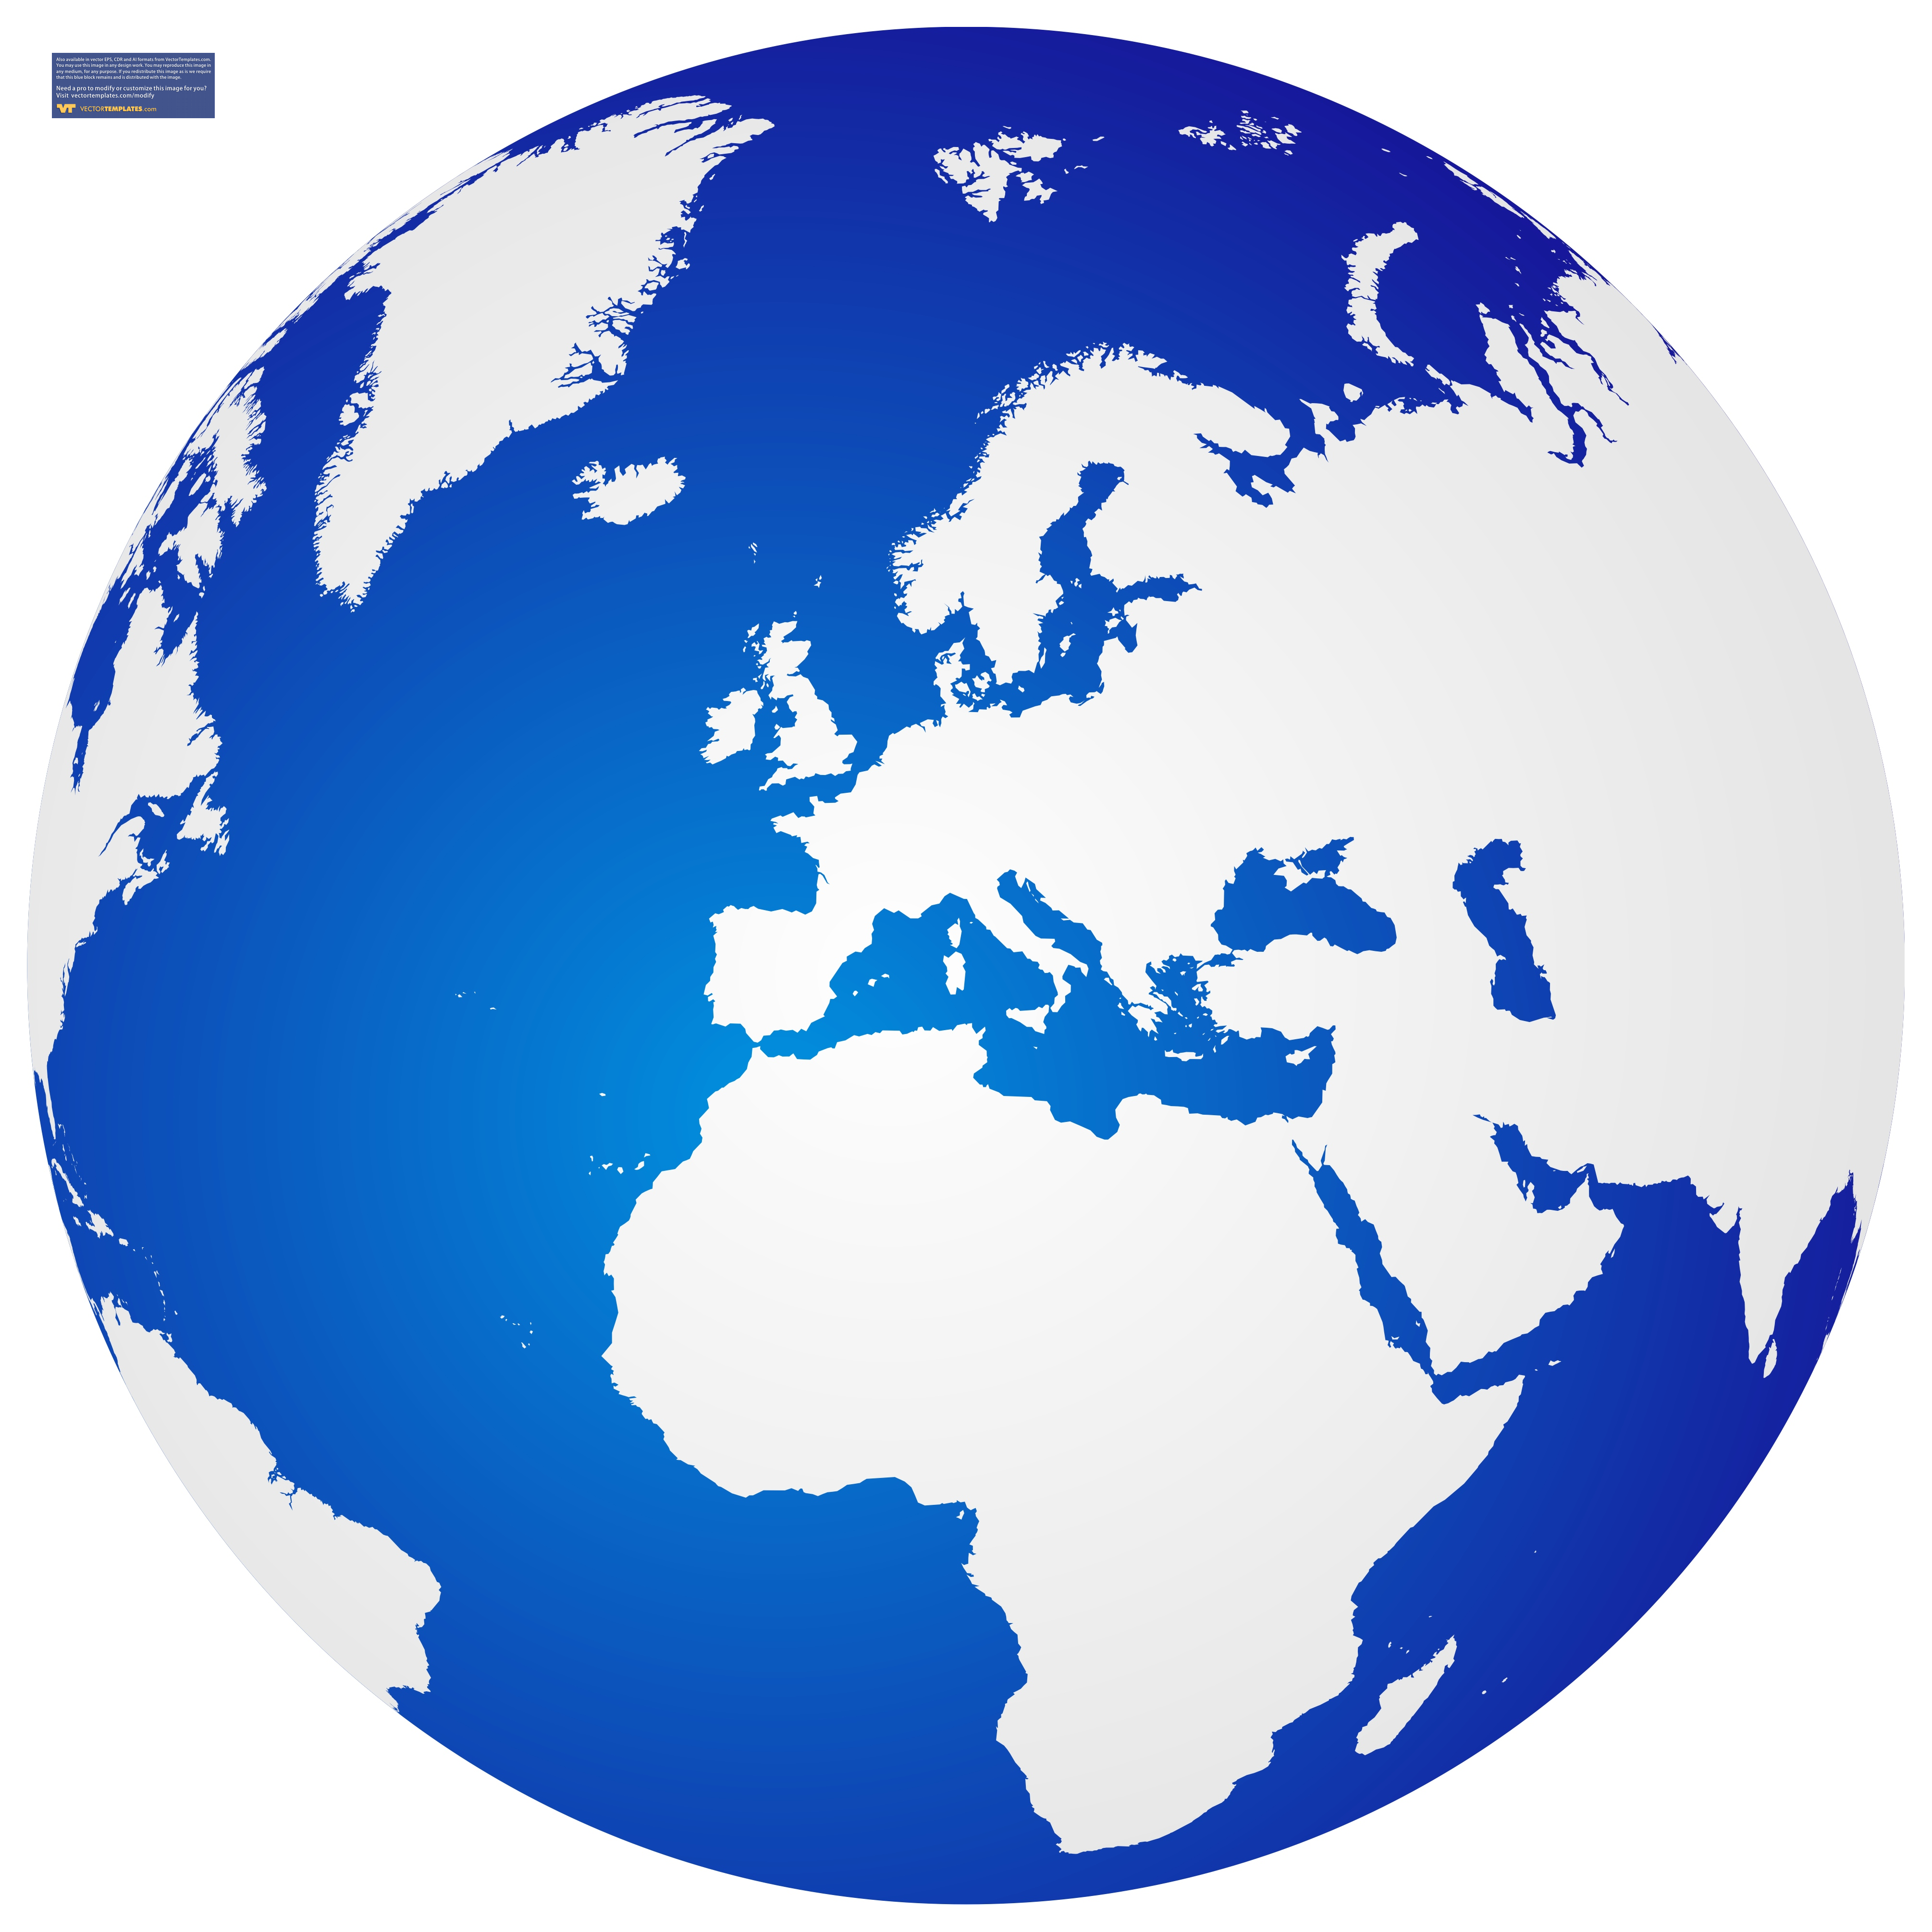 Free world map globe clipart jpg black and white stock World Globe Map Clipart - Clipart Kid jpg black and white stock